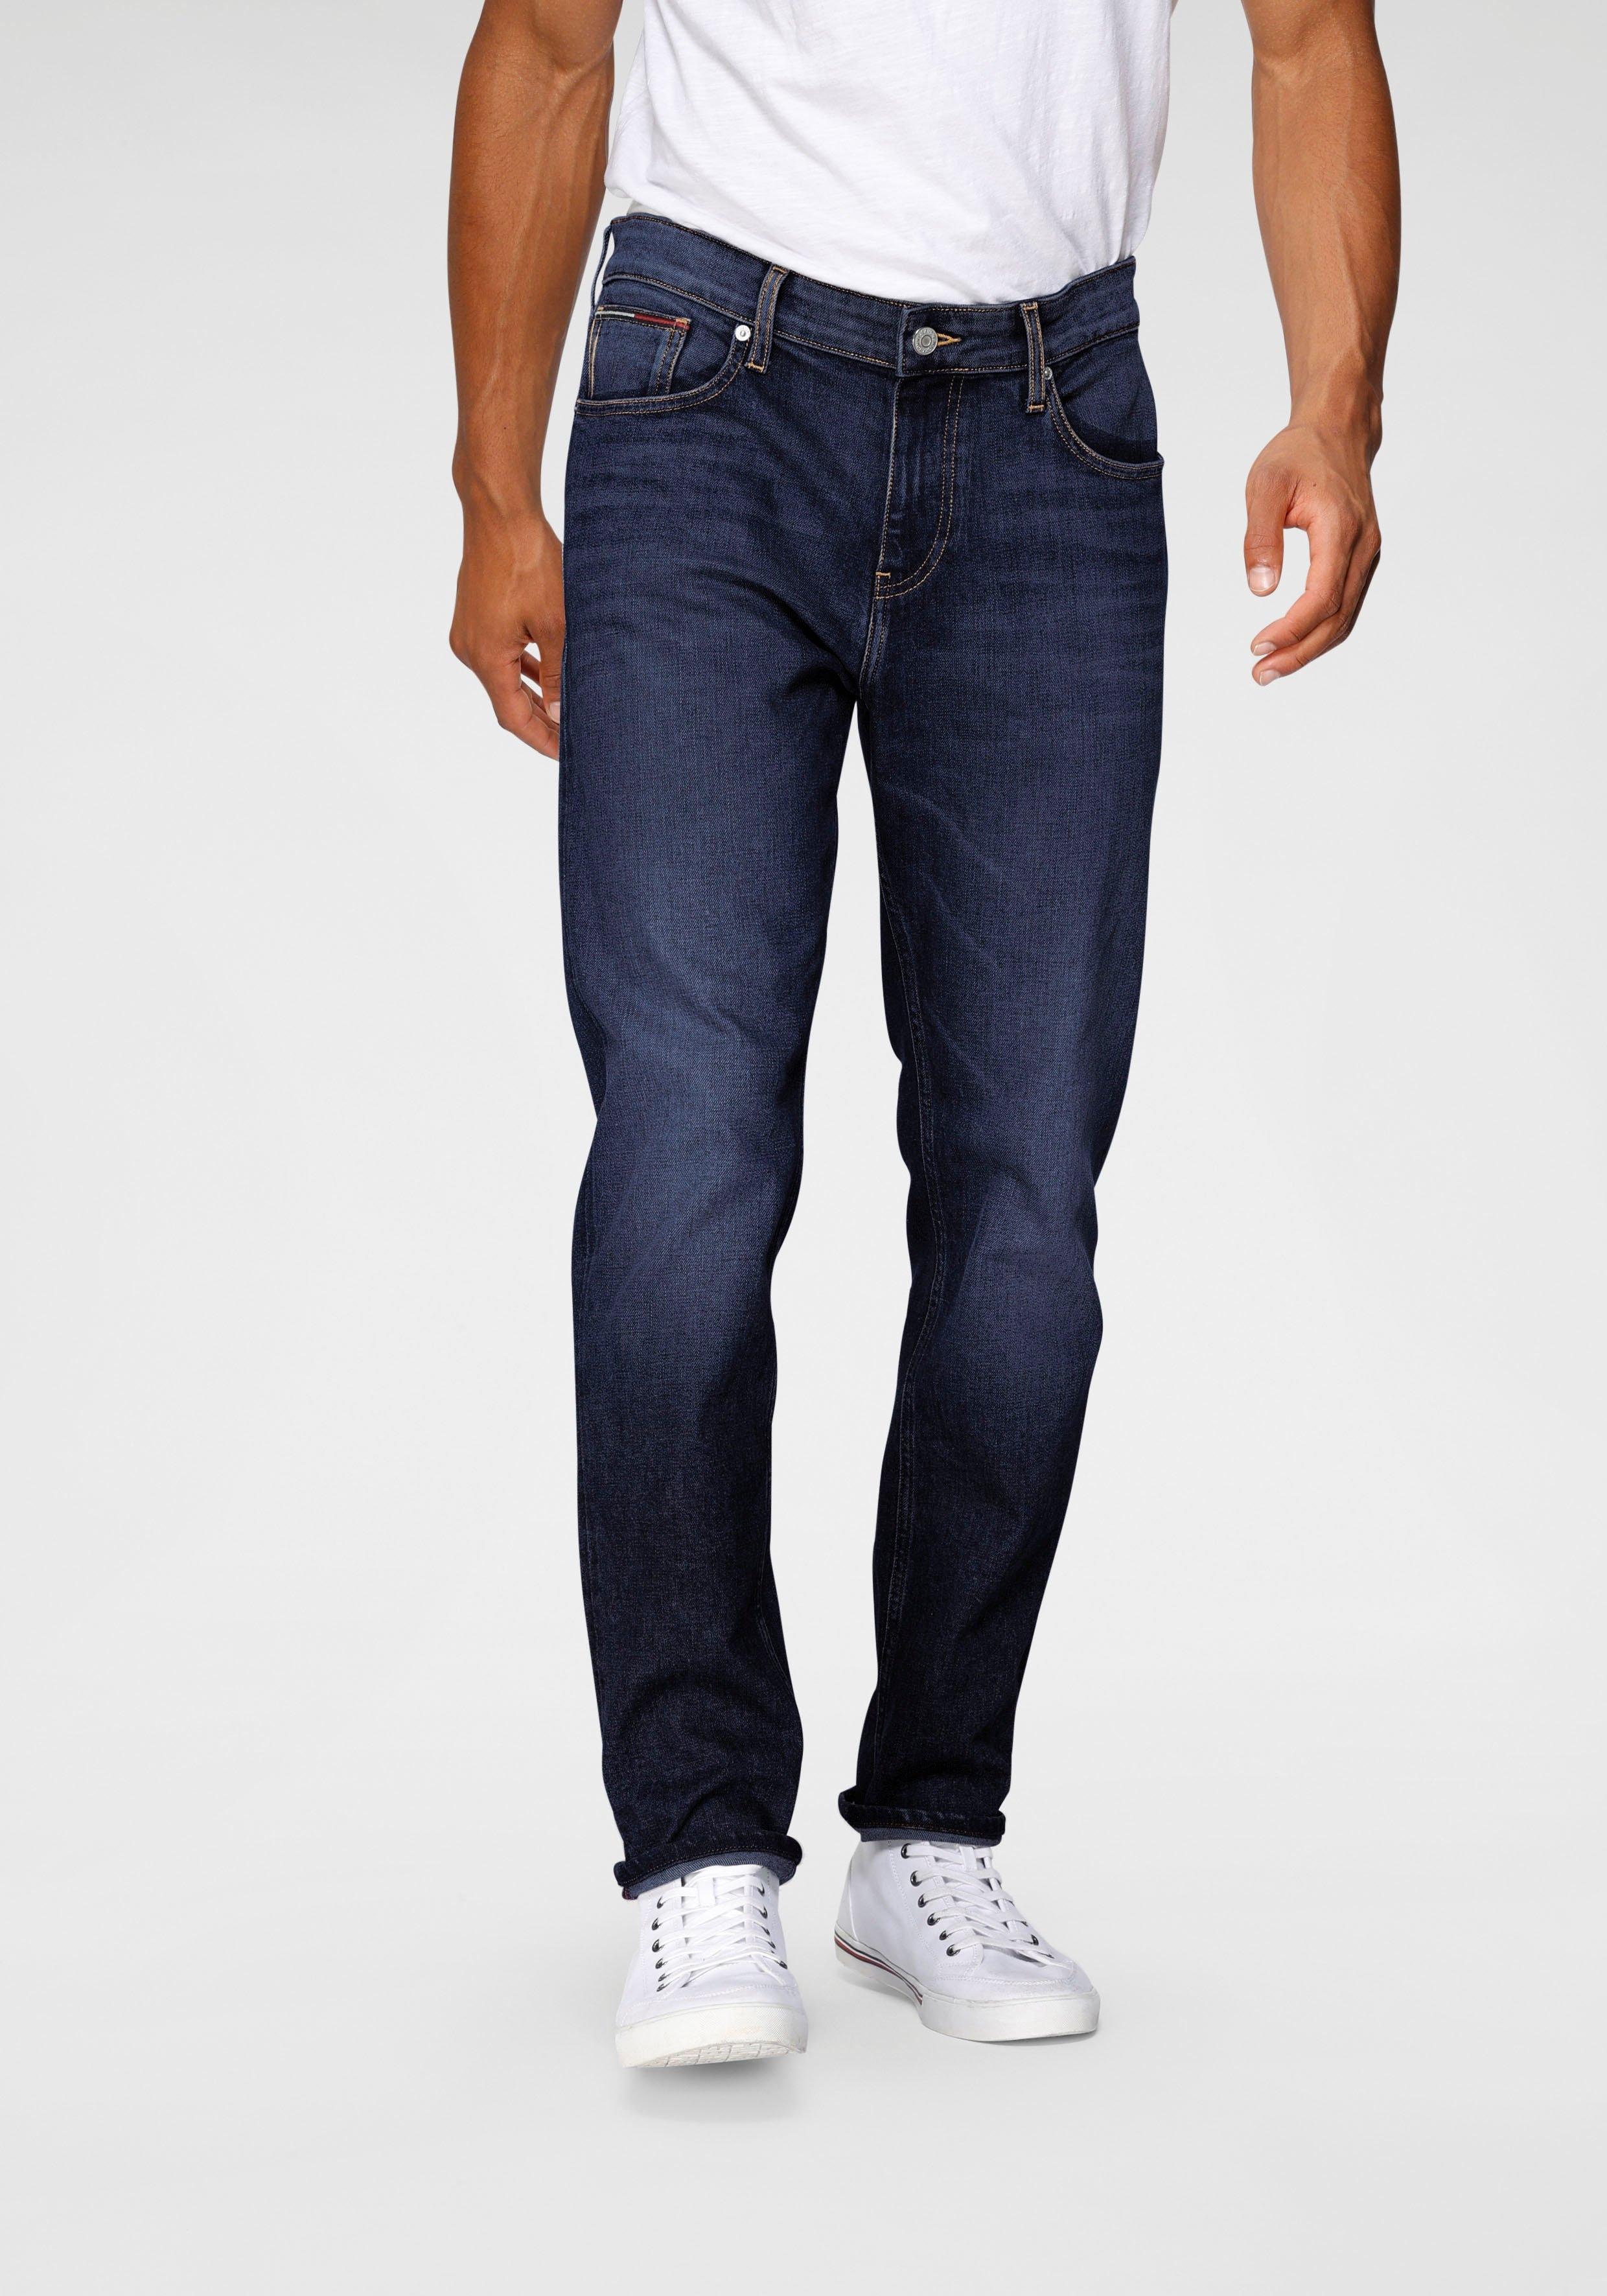 TOMMY JEANS straight jeans ORIGINAL BOOT RYAN - gratis ruilen op otto.nl